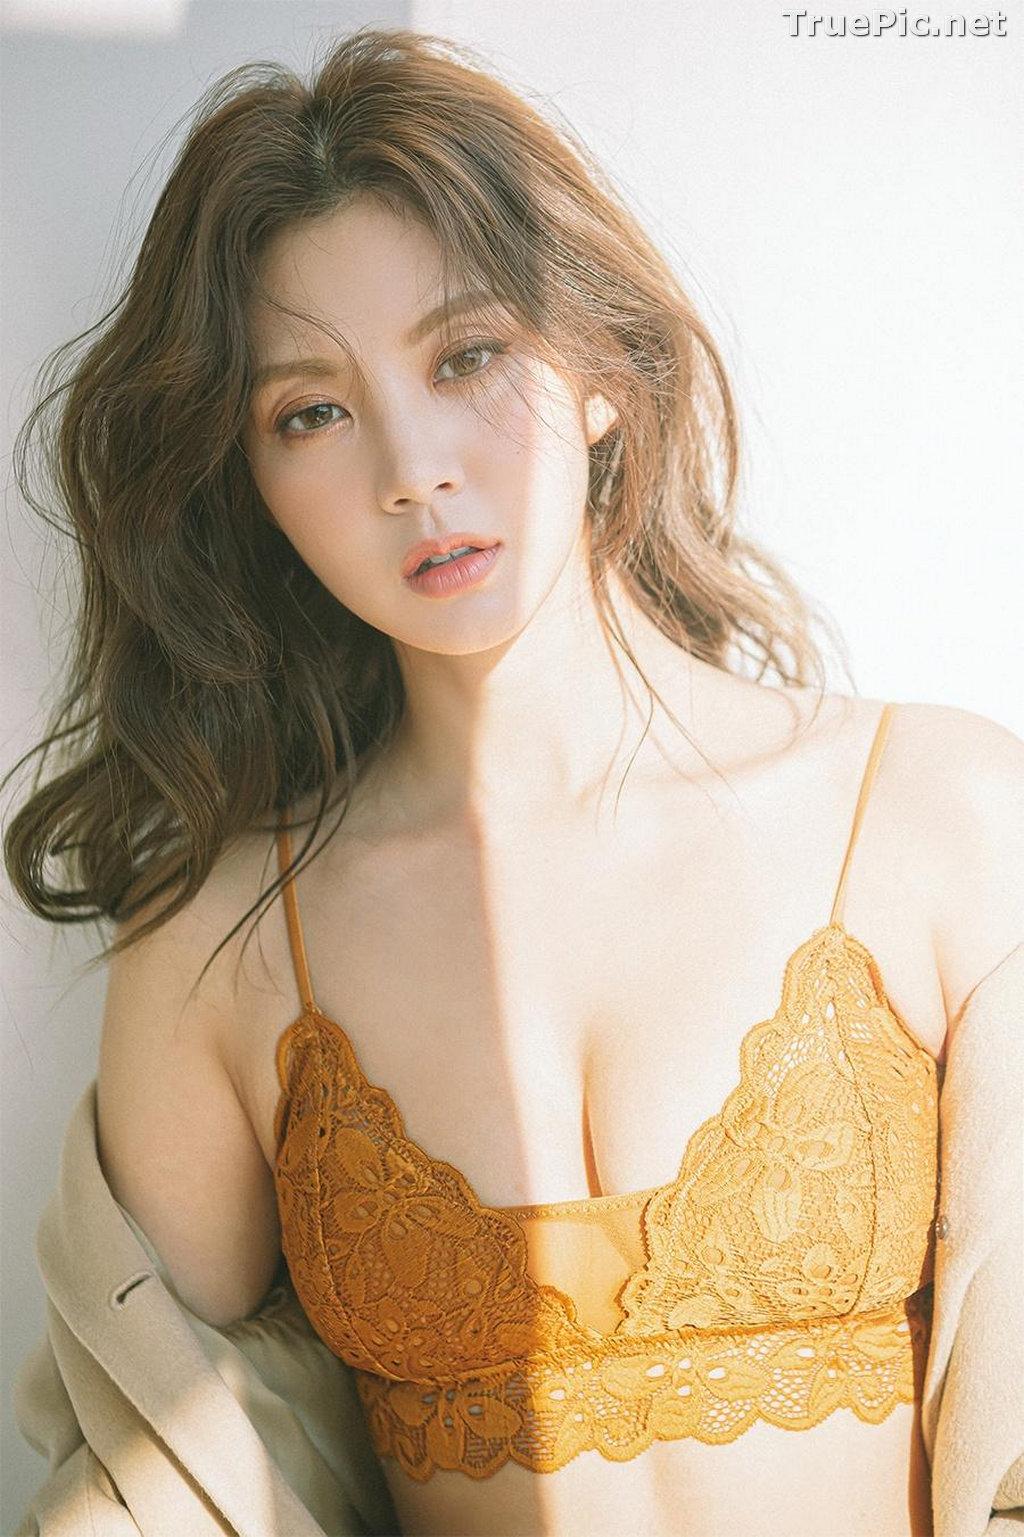 Image Korean Fashion Model – Lee Chae Eun (이채은) – Come On Vincent Lingerie #10 - TruePic.net - Picture-4